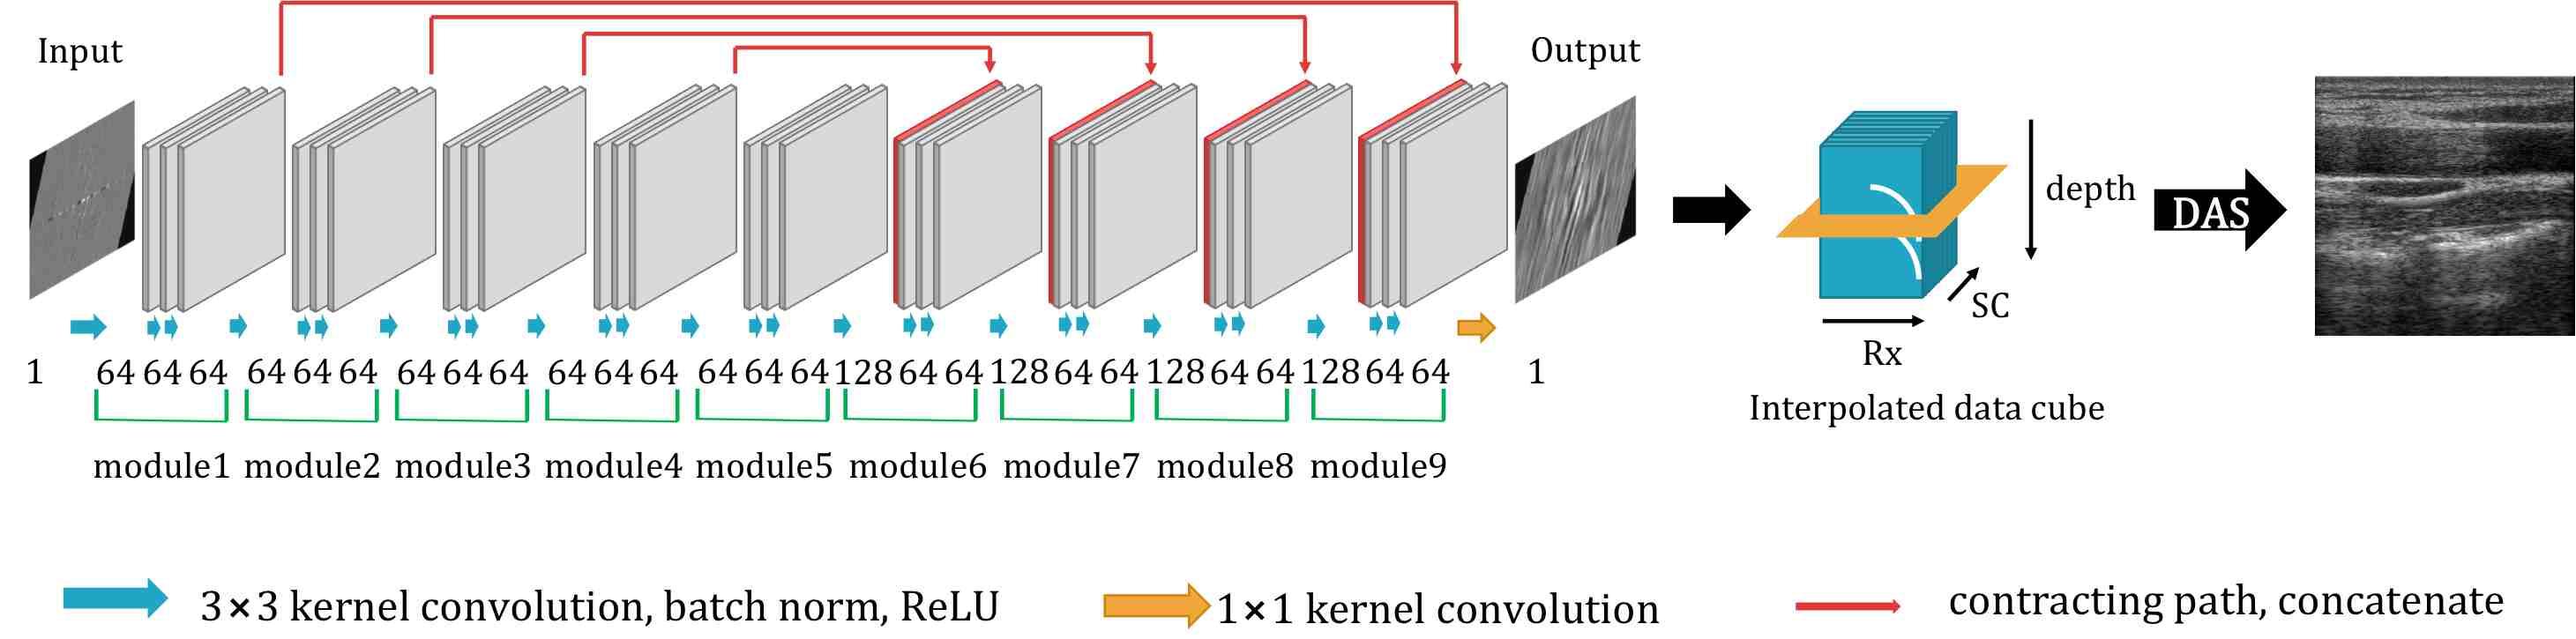 Deep Learning in RF Sub-sampled B-mode Ultrasound Imaging